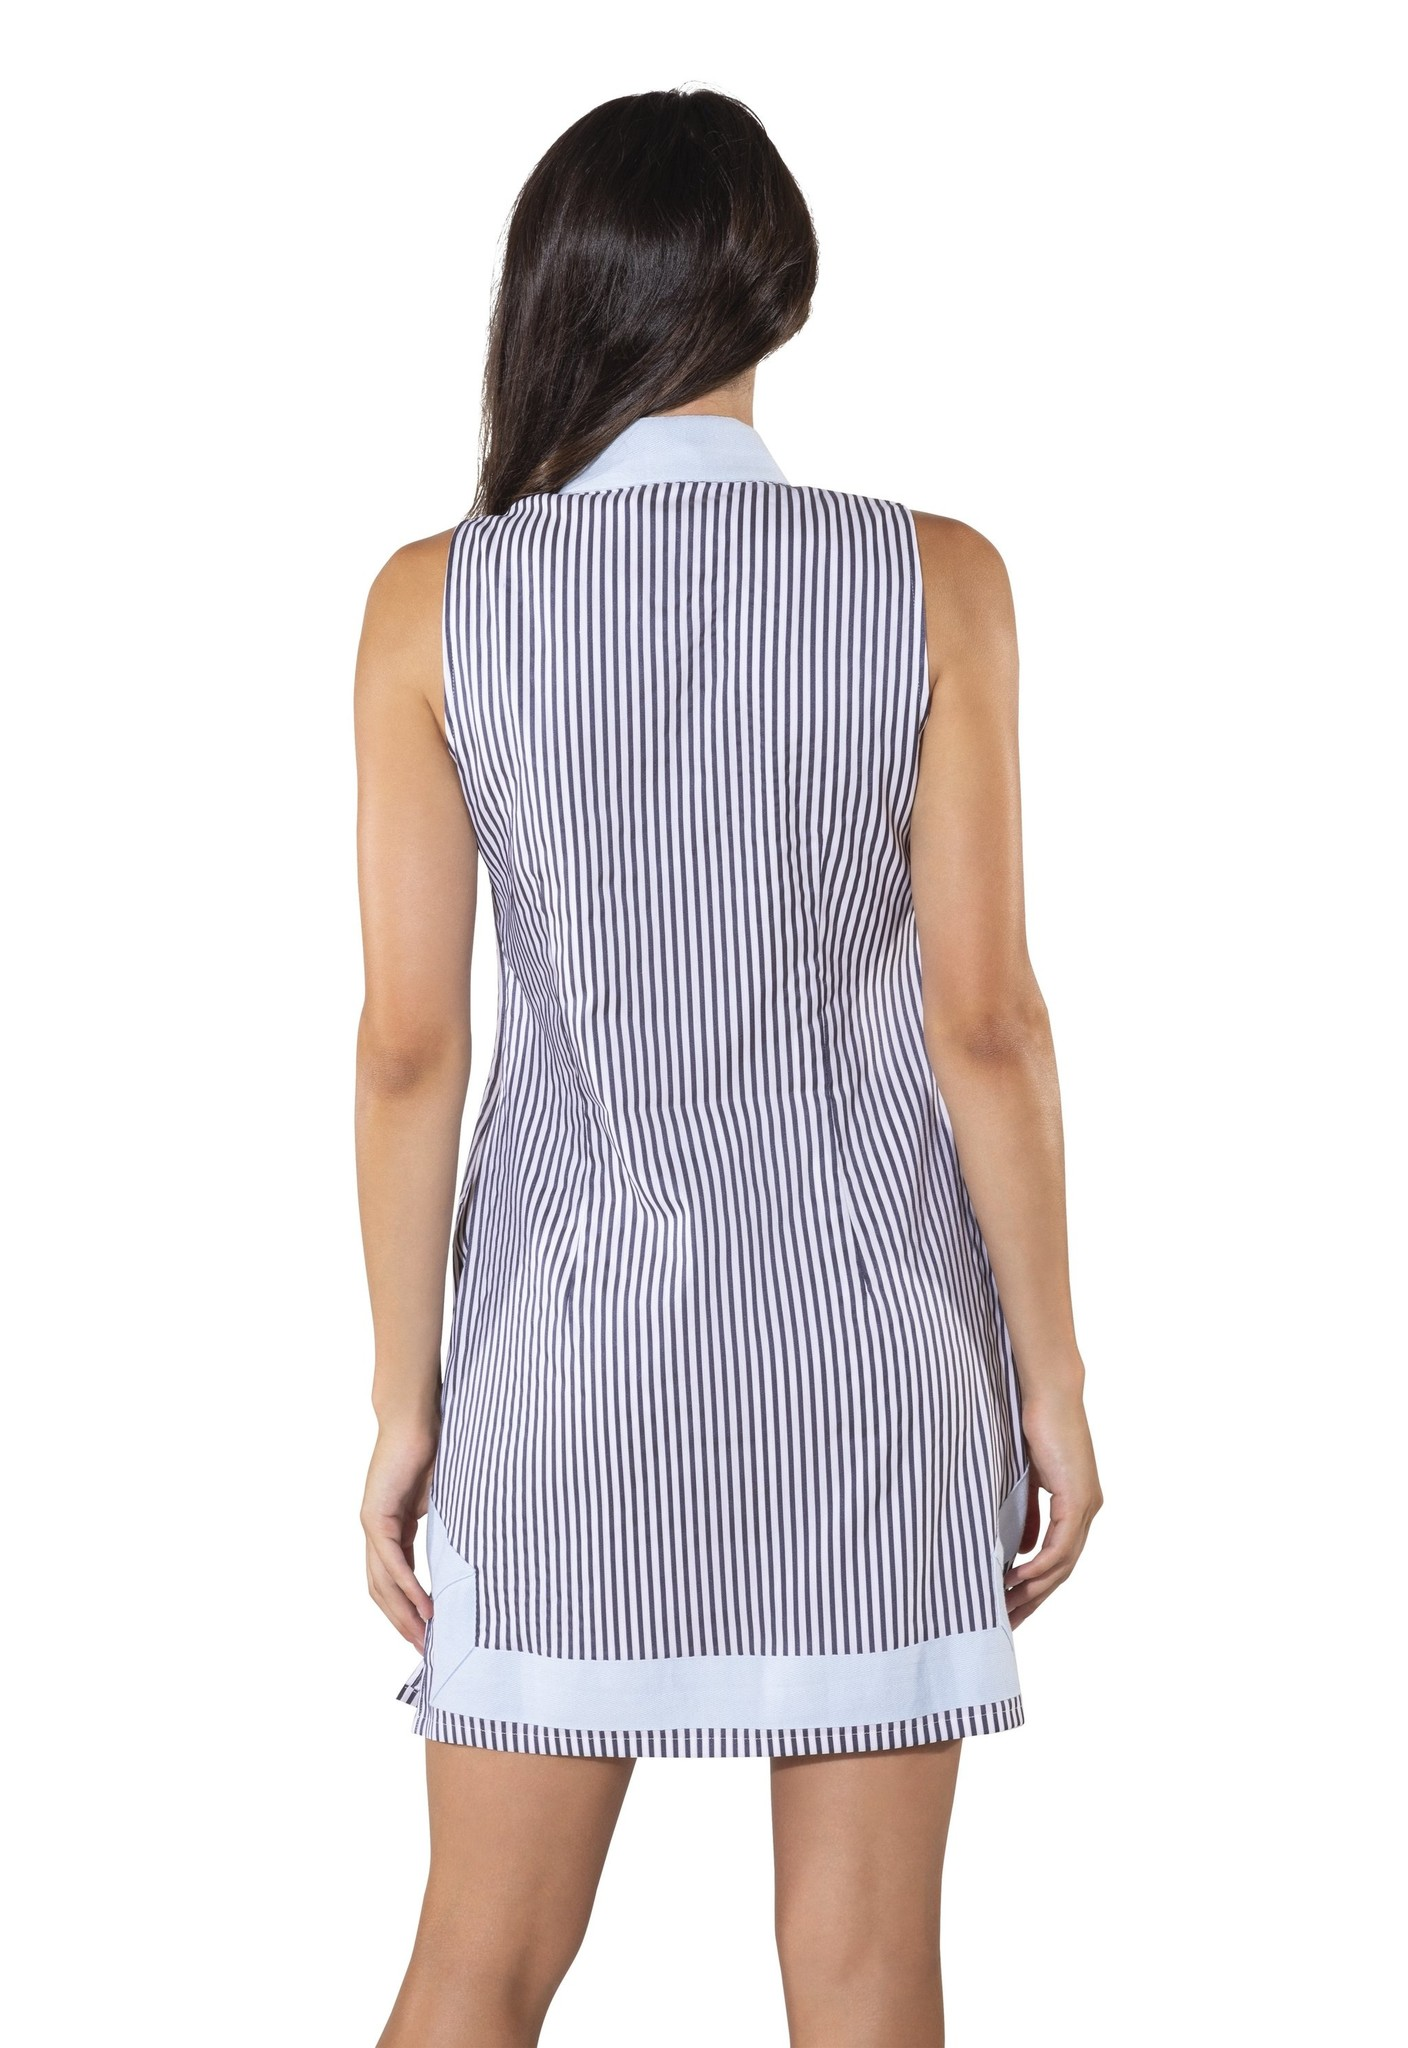 Stripe Shirting Sleeveless Classic Tunic